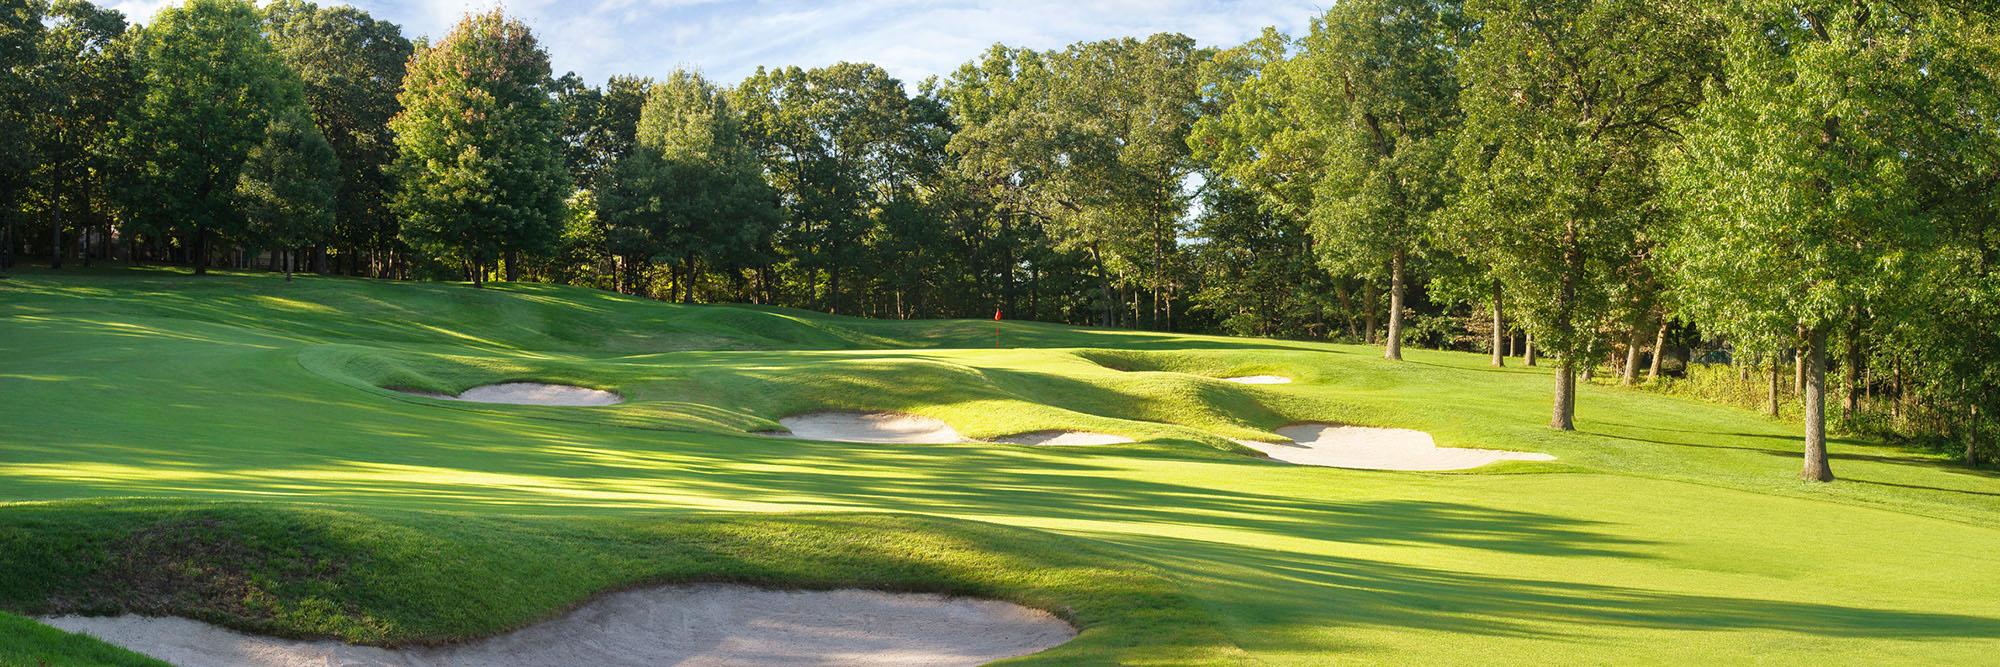 Golf Course Image - The Club at Porto Cima No. 10